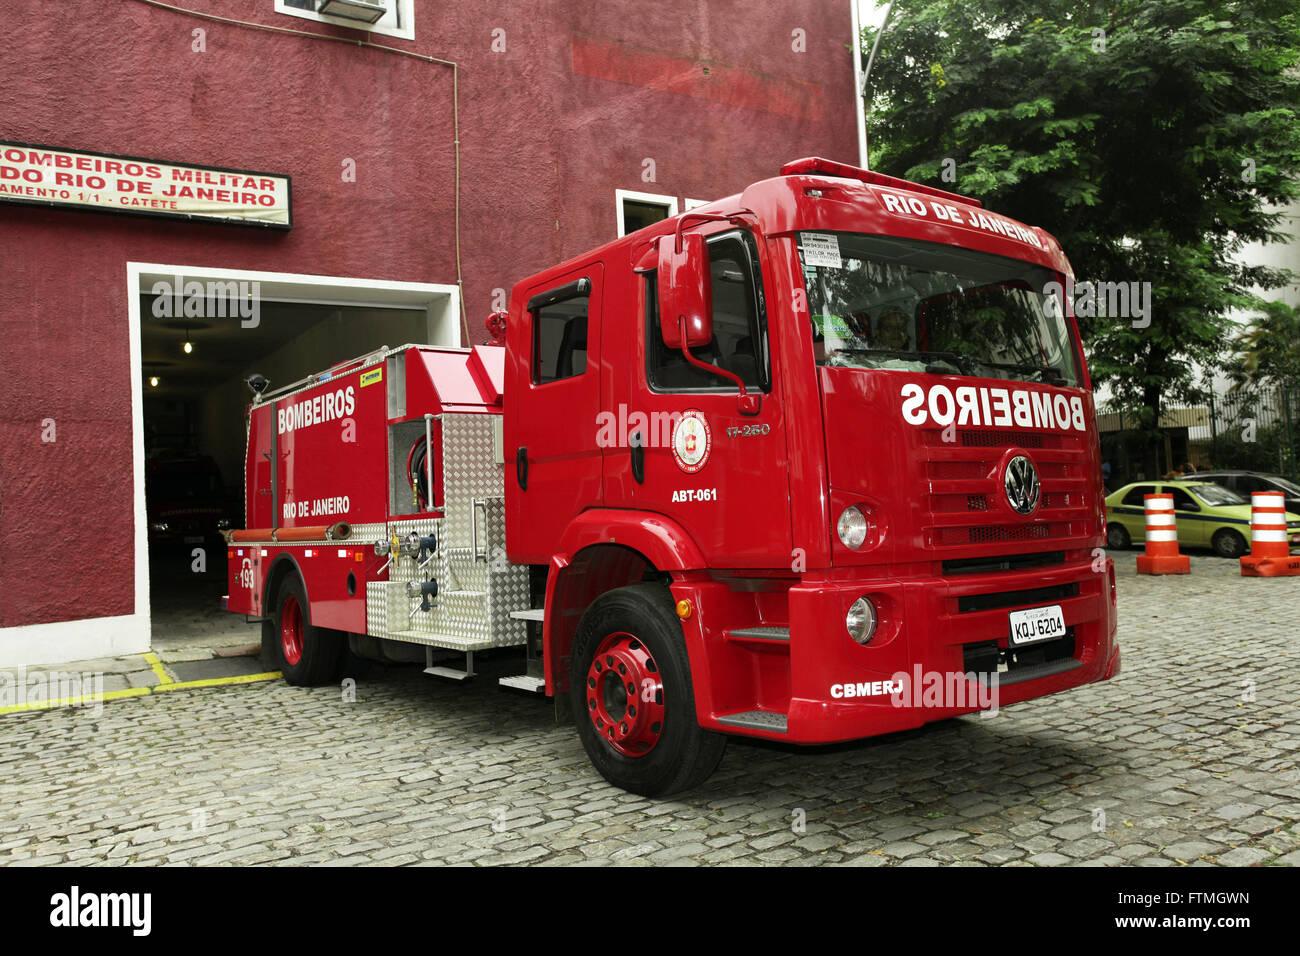 Grouping the Fire Brigade of the State of Rio de Janeiro - Stock Image